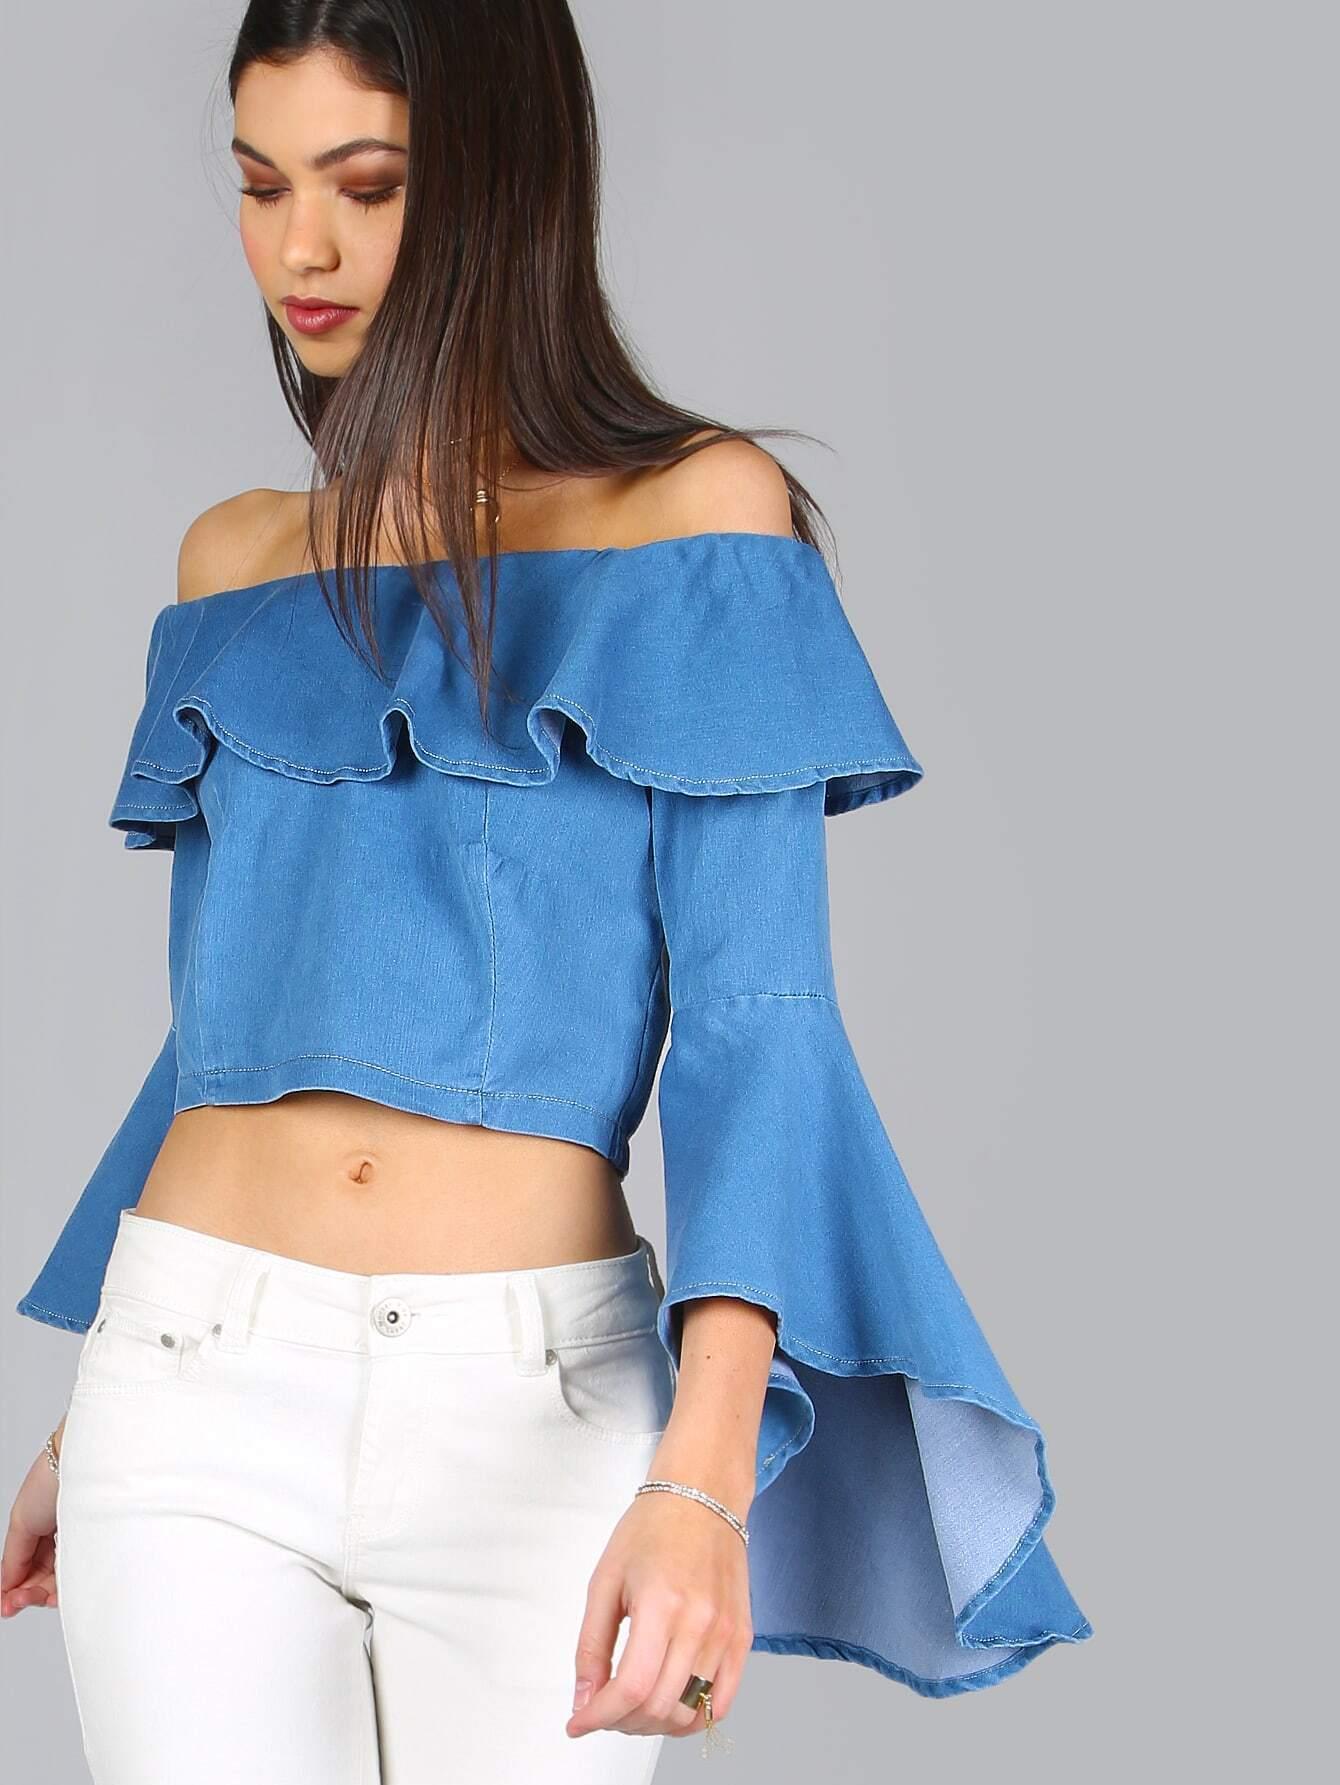 60bca836c223d Denim Ruffle Bell Sleeve Top DENIM EmmaCloth-Women Fast Fashion Online